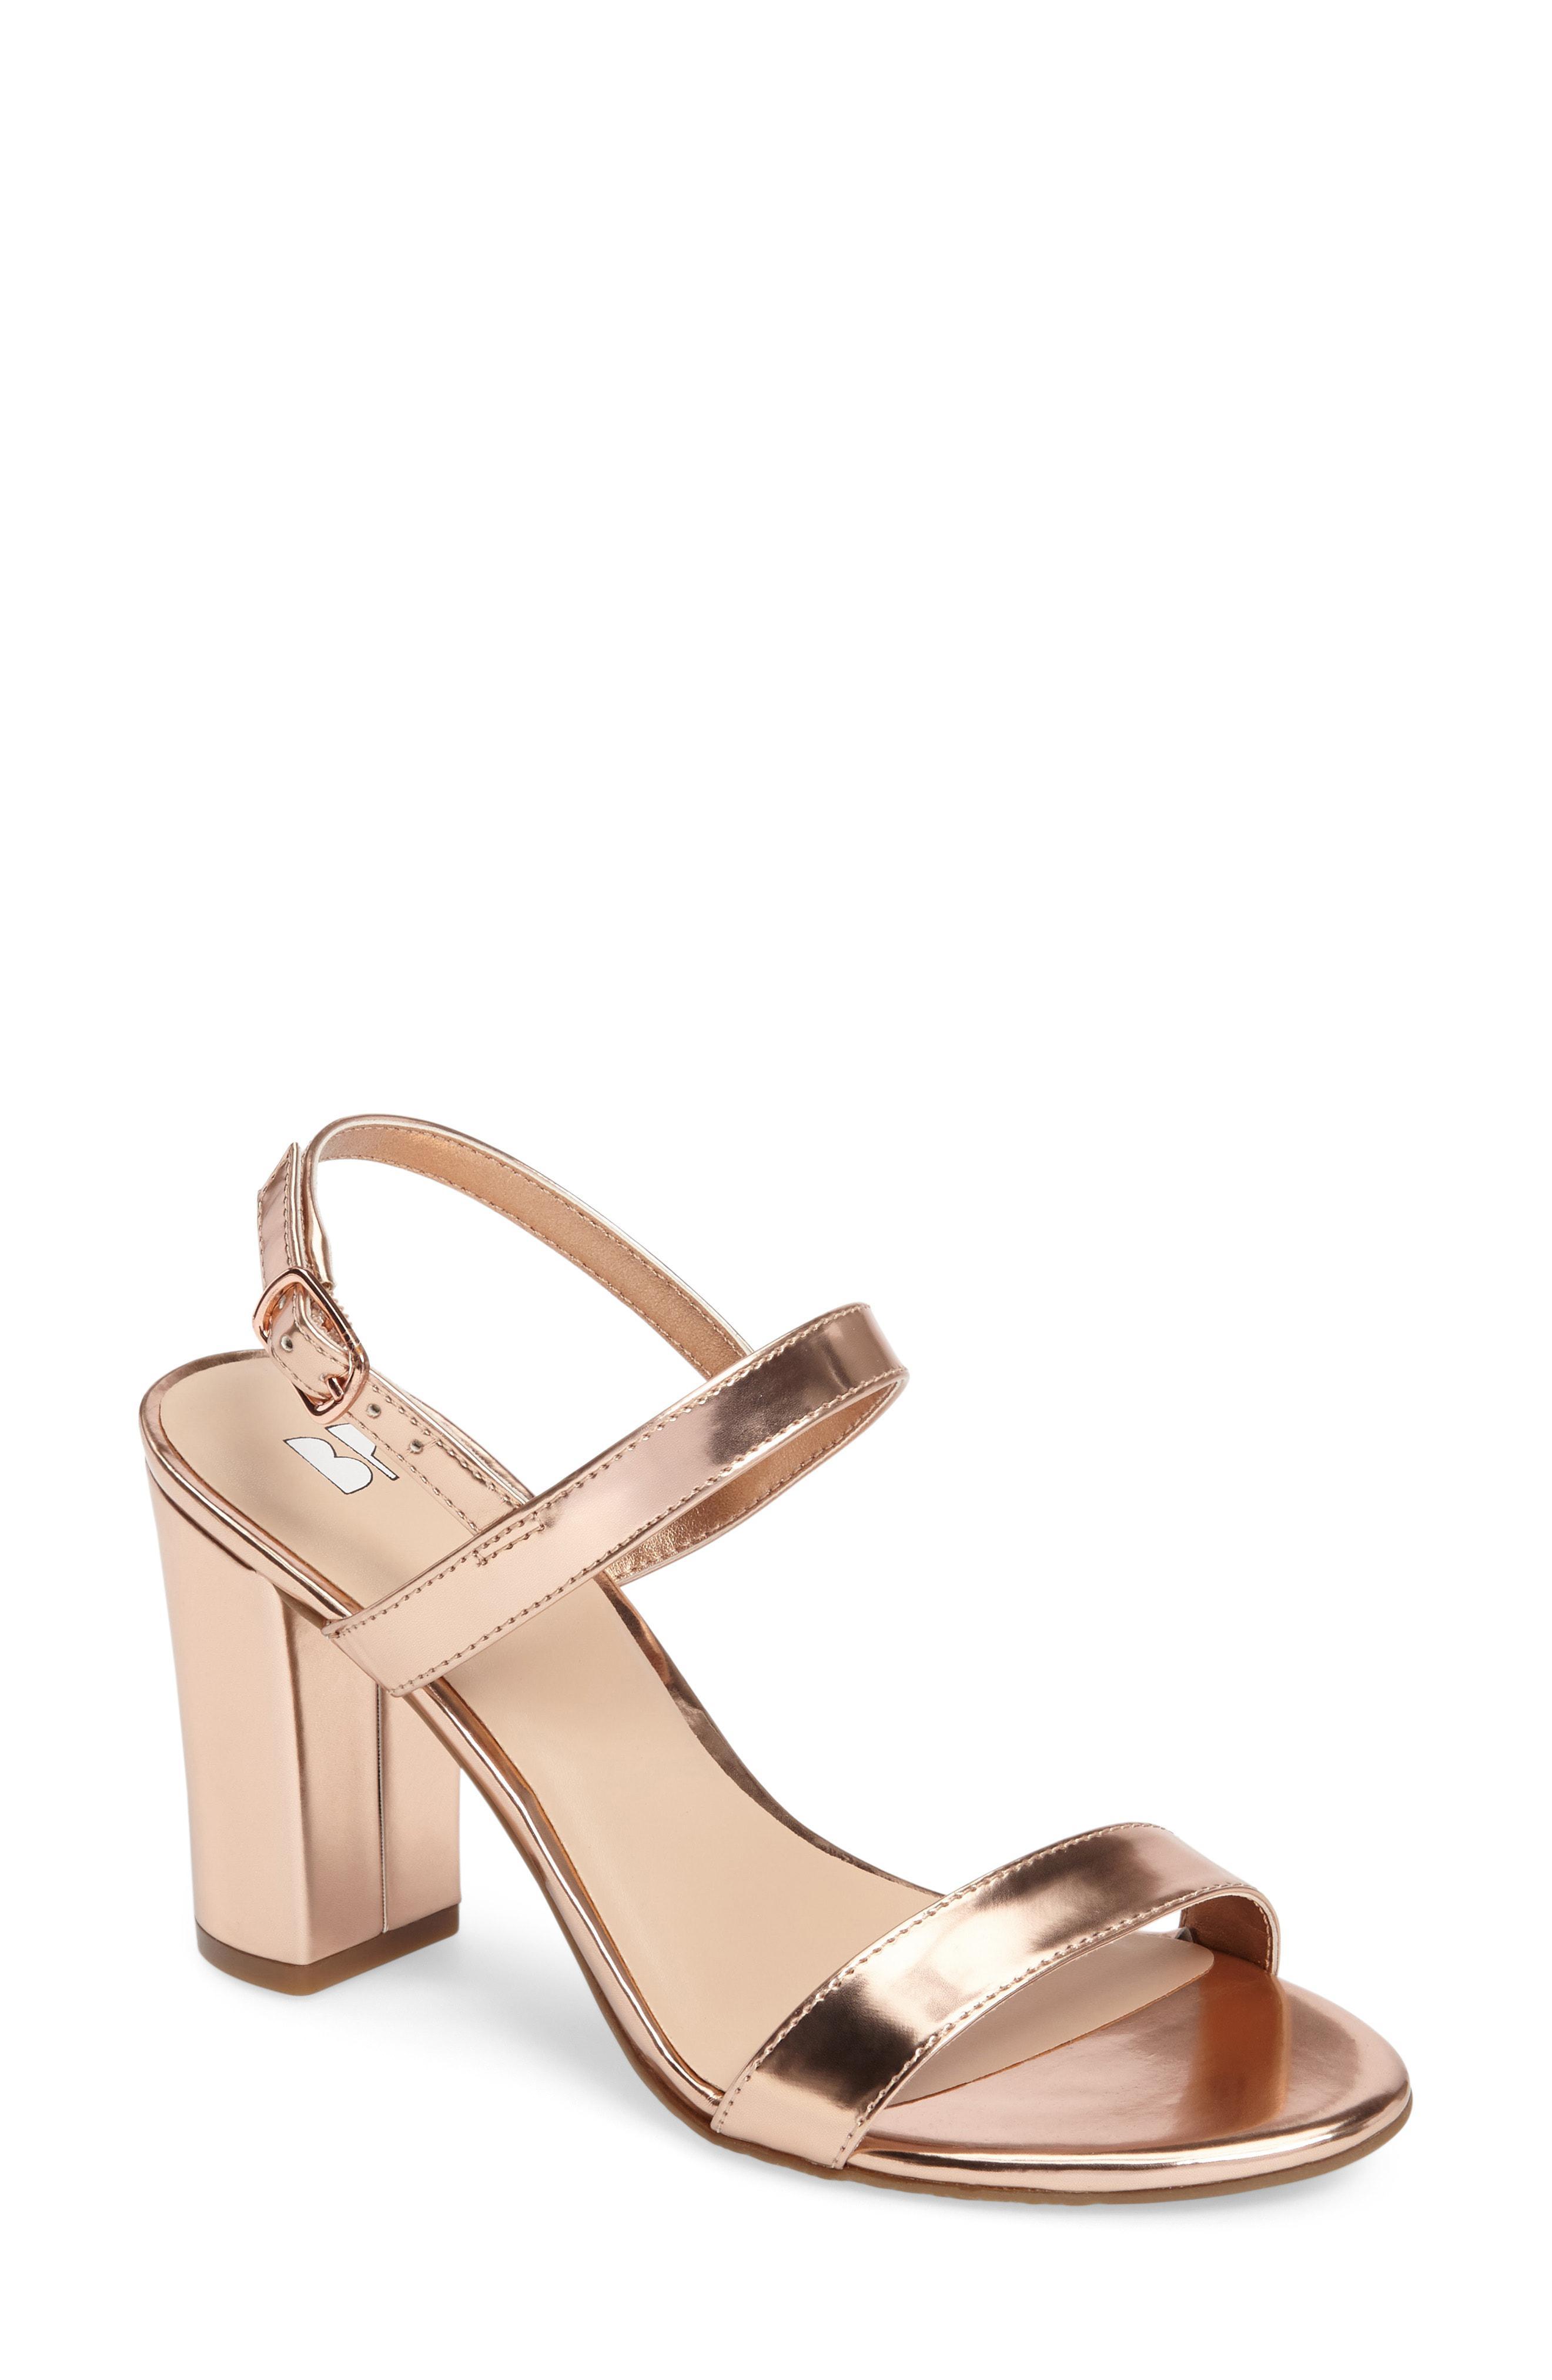 5cd02709dcd4 Lyst - BP. Lula Block Heel Slingback Sandal in Metallic